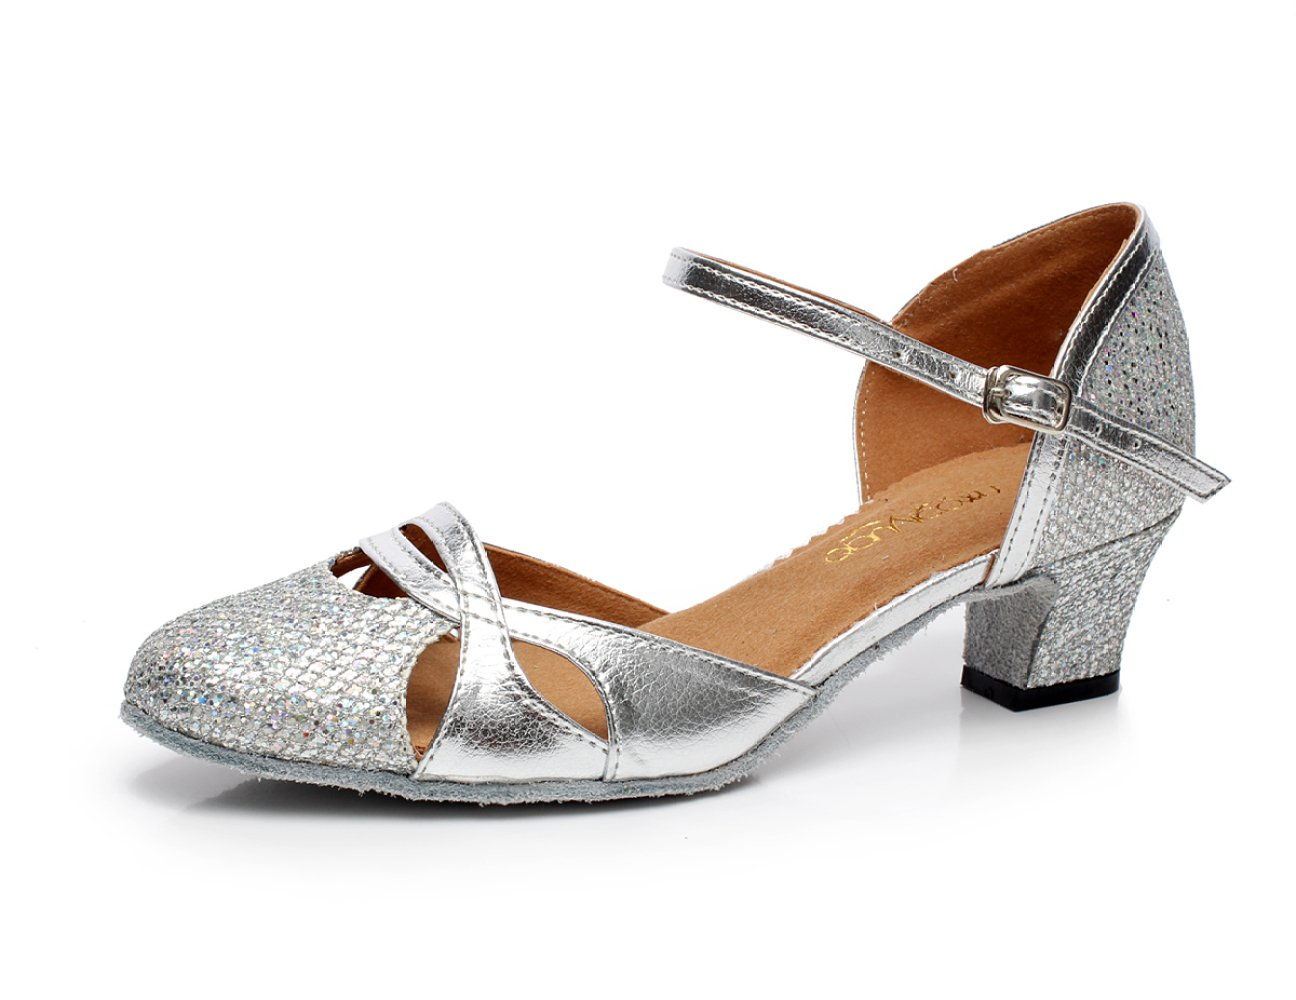 JSHOE Damen Pailletten Round Toe Latin Tanzschuhe Salsa/Tango/Tee/Samba/Modern/Jazz Schuhe Sandalen High Heels,GoldHeeled6cm-UK5.5/EU38/Our39  UK5.5/EU38/Our39|Goldheeled6cm